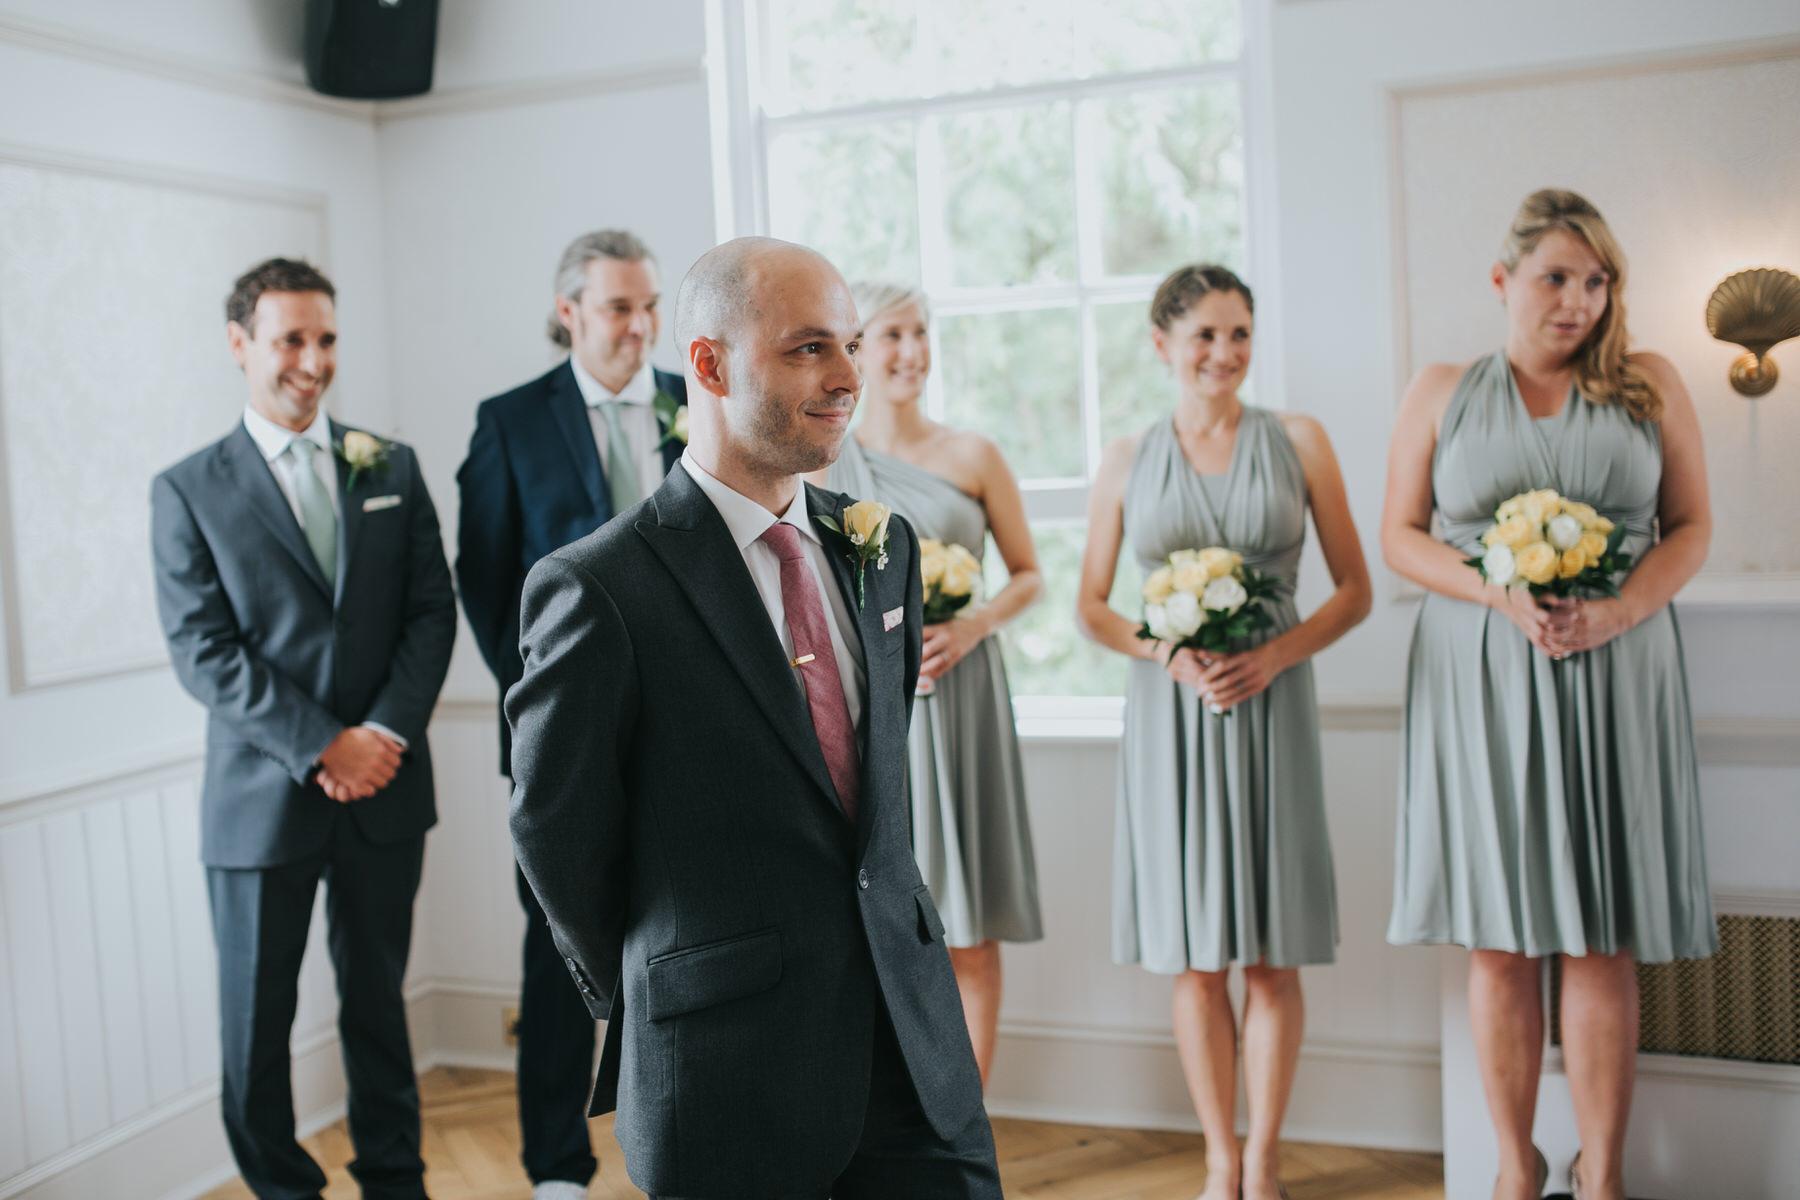 88 groom waiting bestmen bridesmaids Dulwich marriage ceremony.jpg